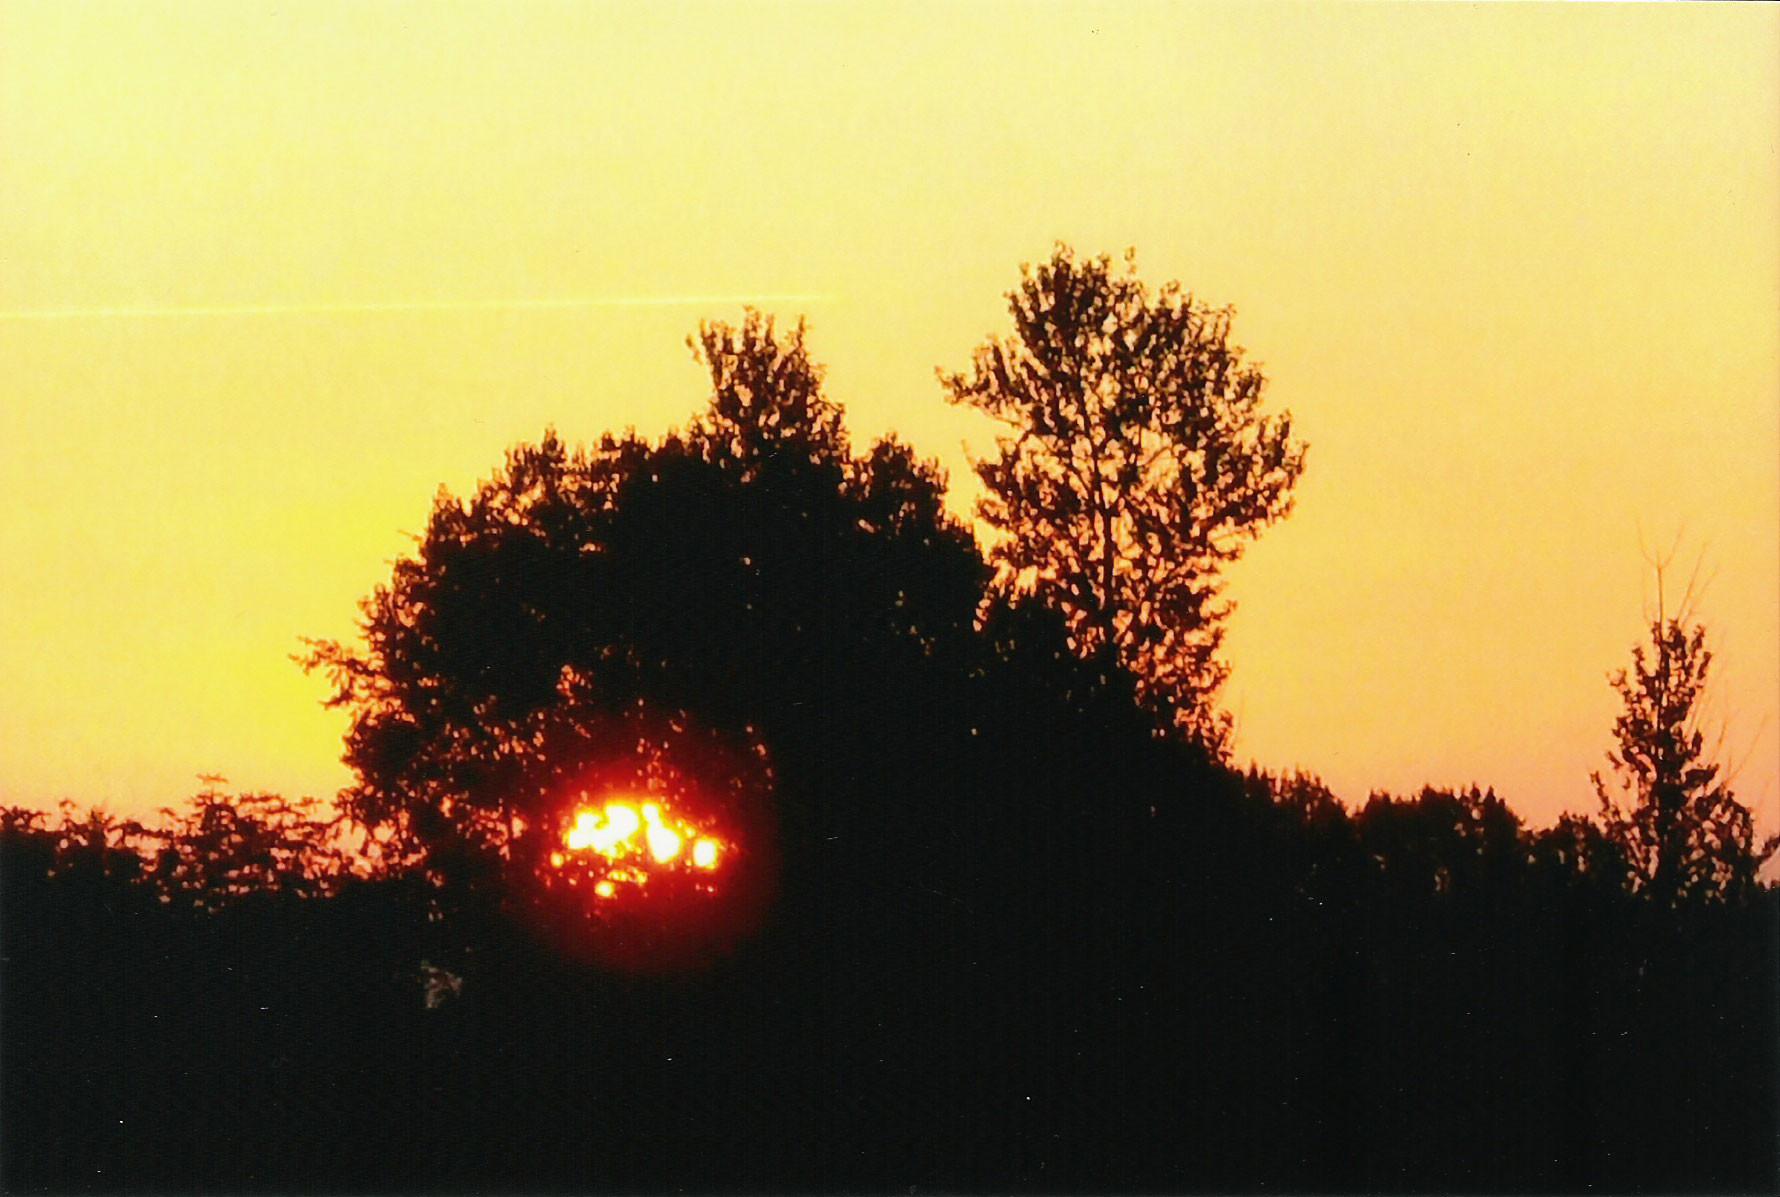 """Katze frißt Sonne"", Sonnenaufgang auf Poel / Foto L.H."